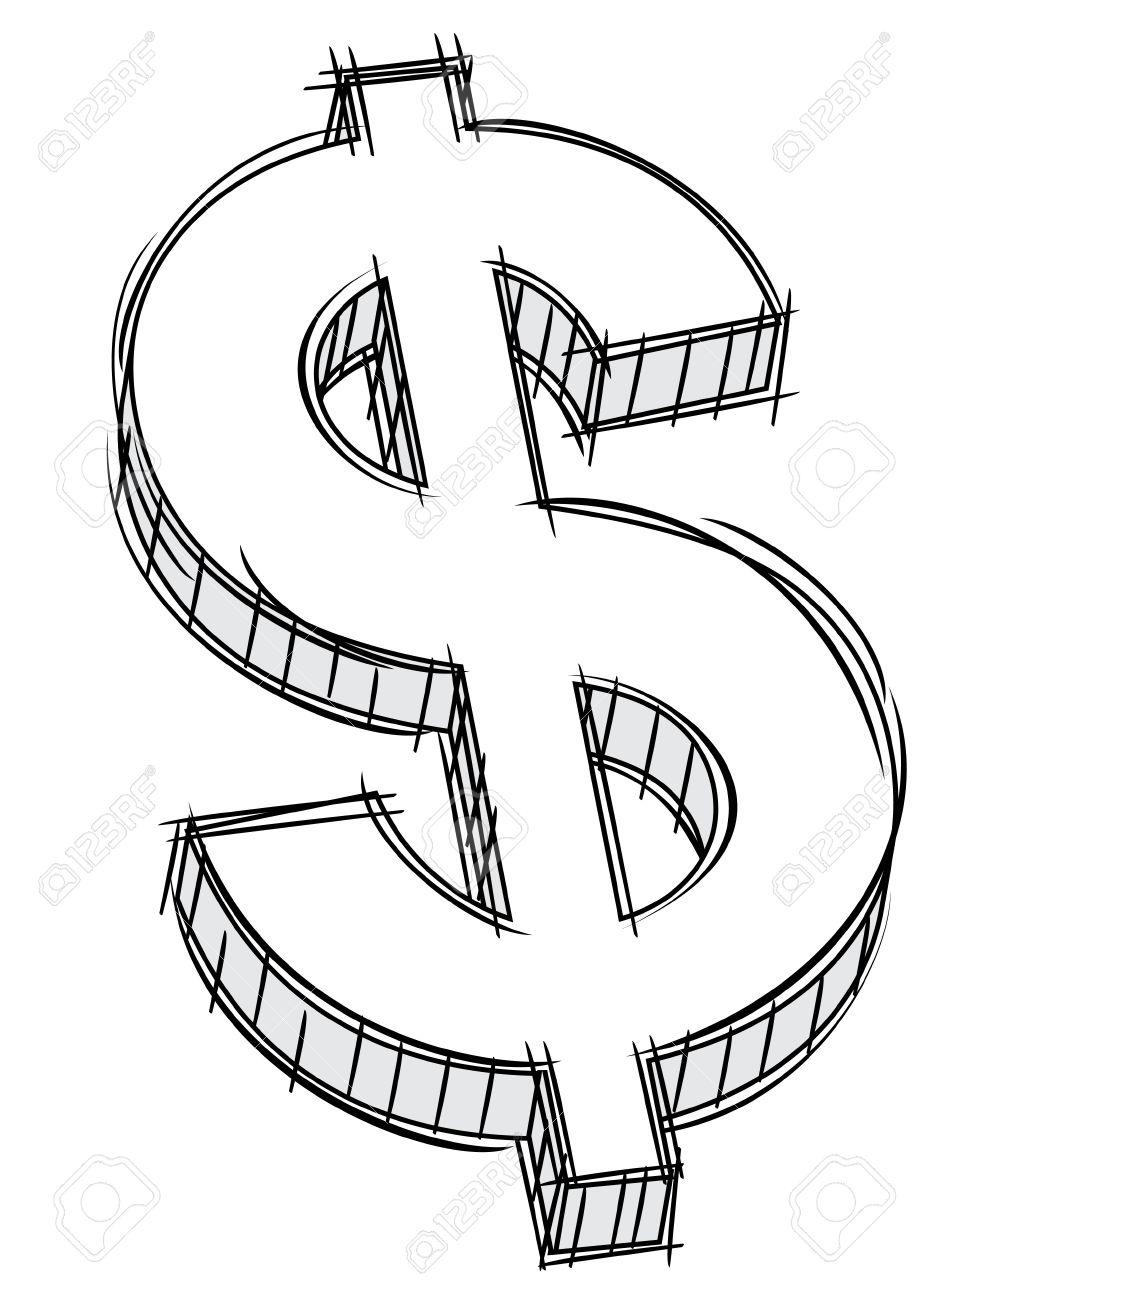 1125x1300 Money Sign Group